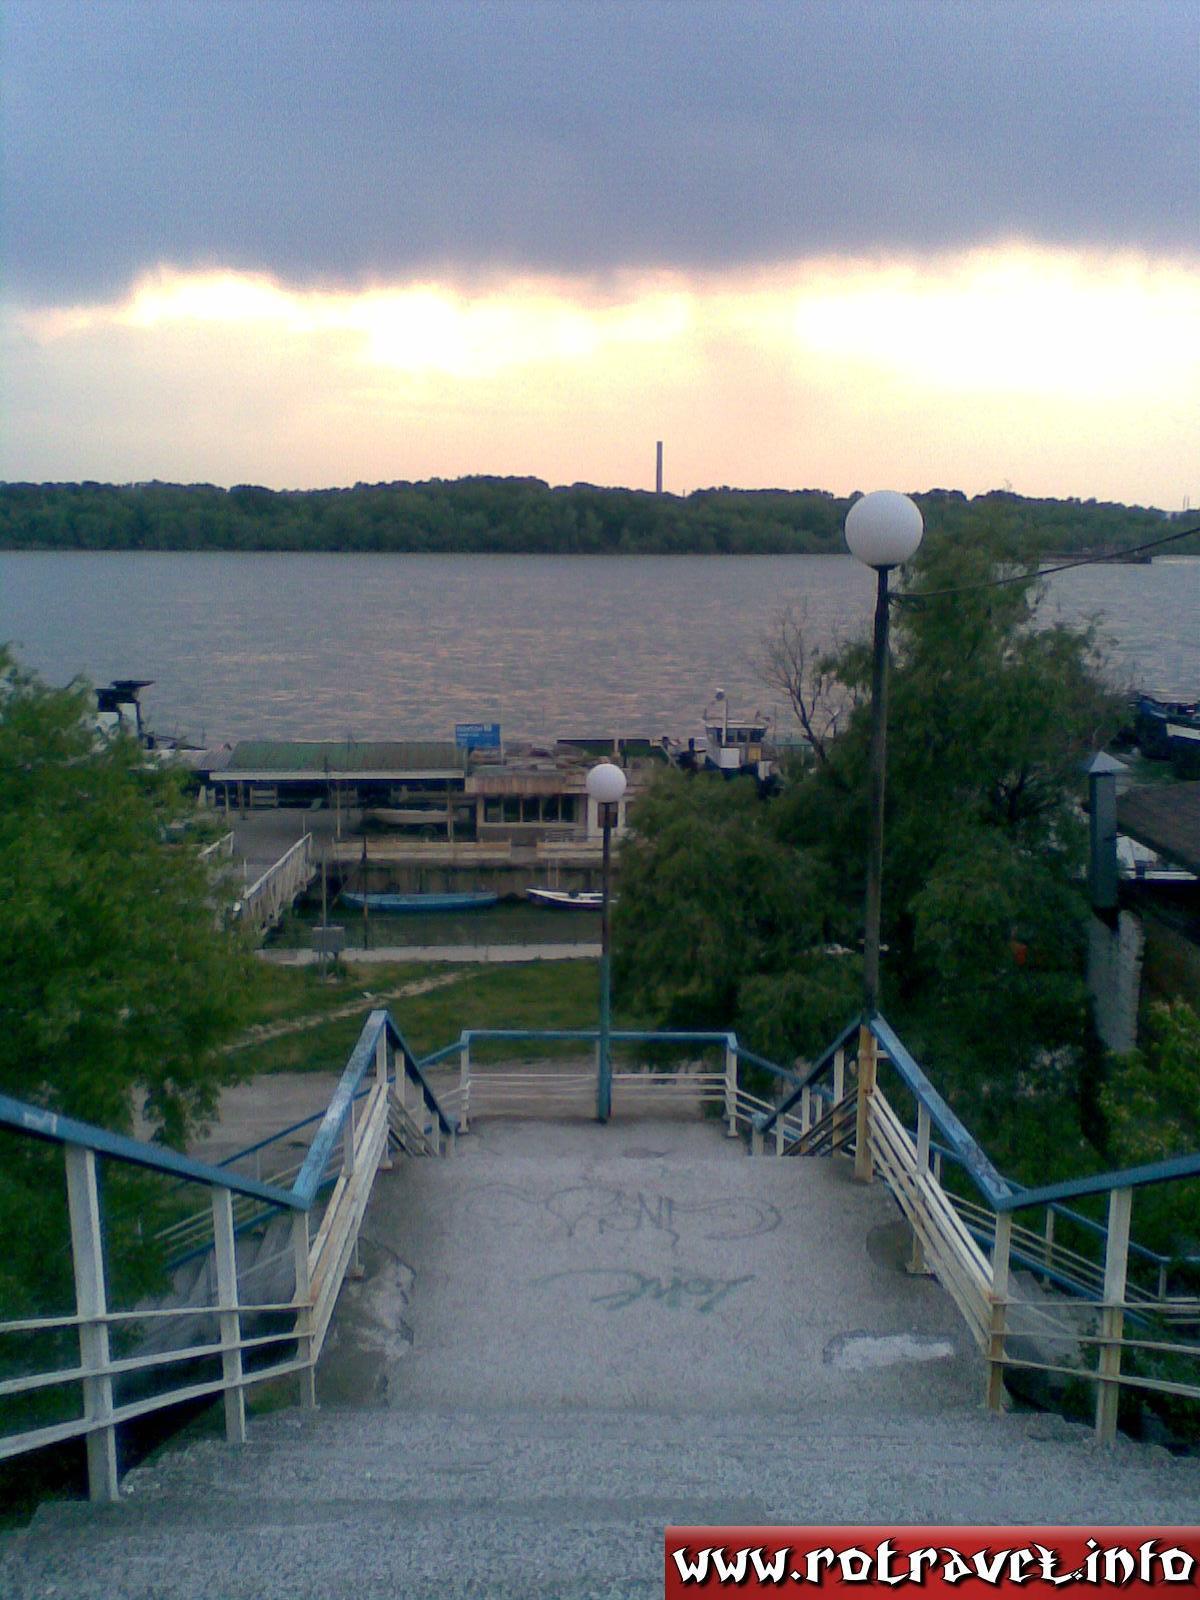 The Danube in Rousse